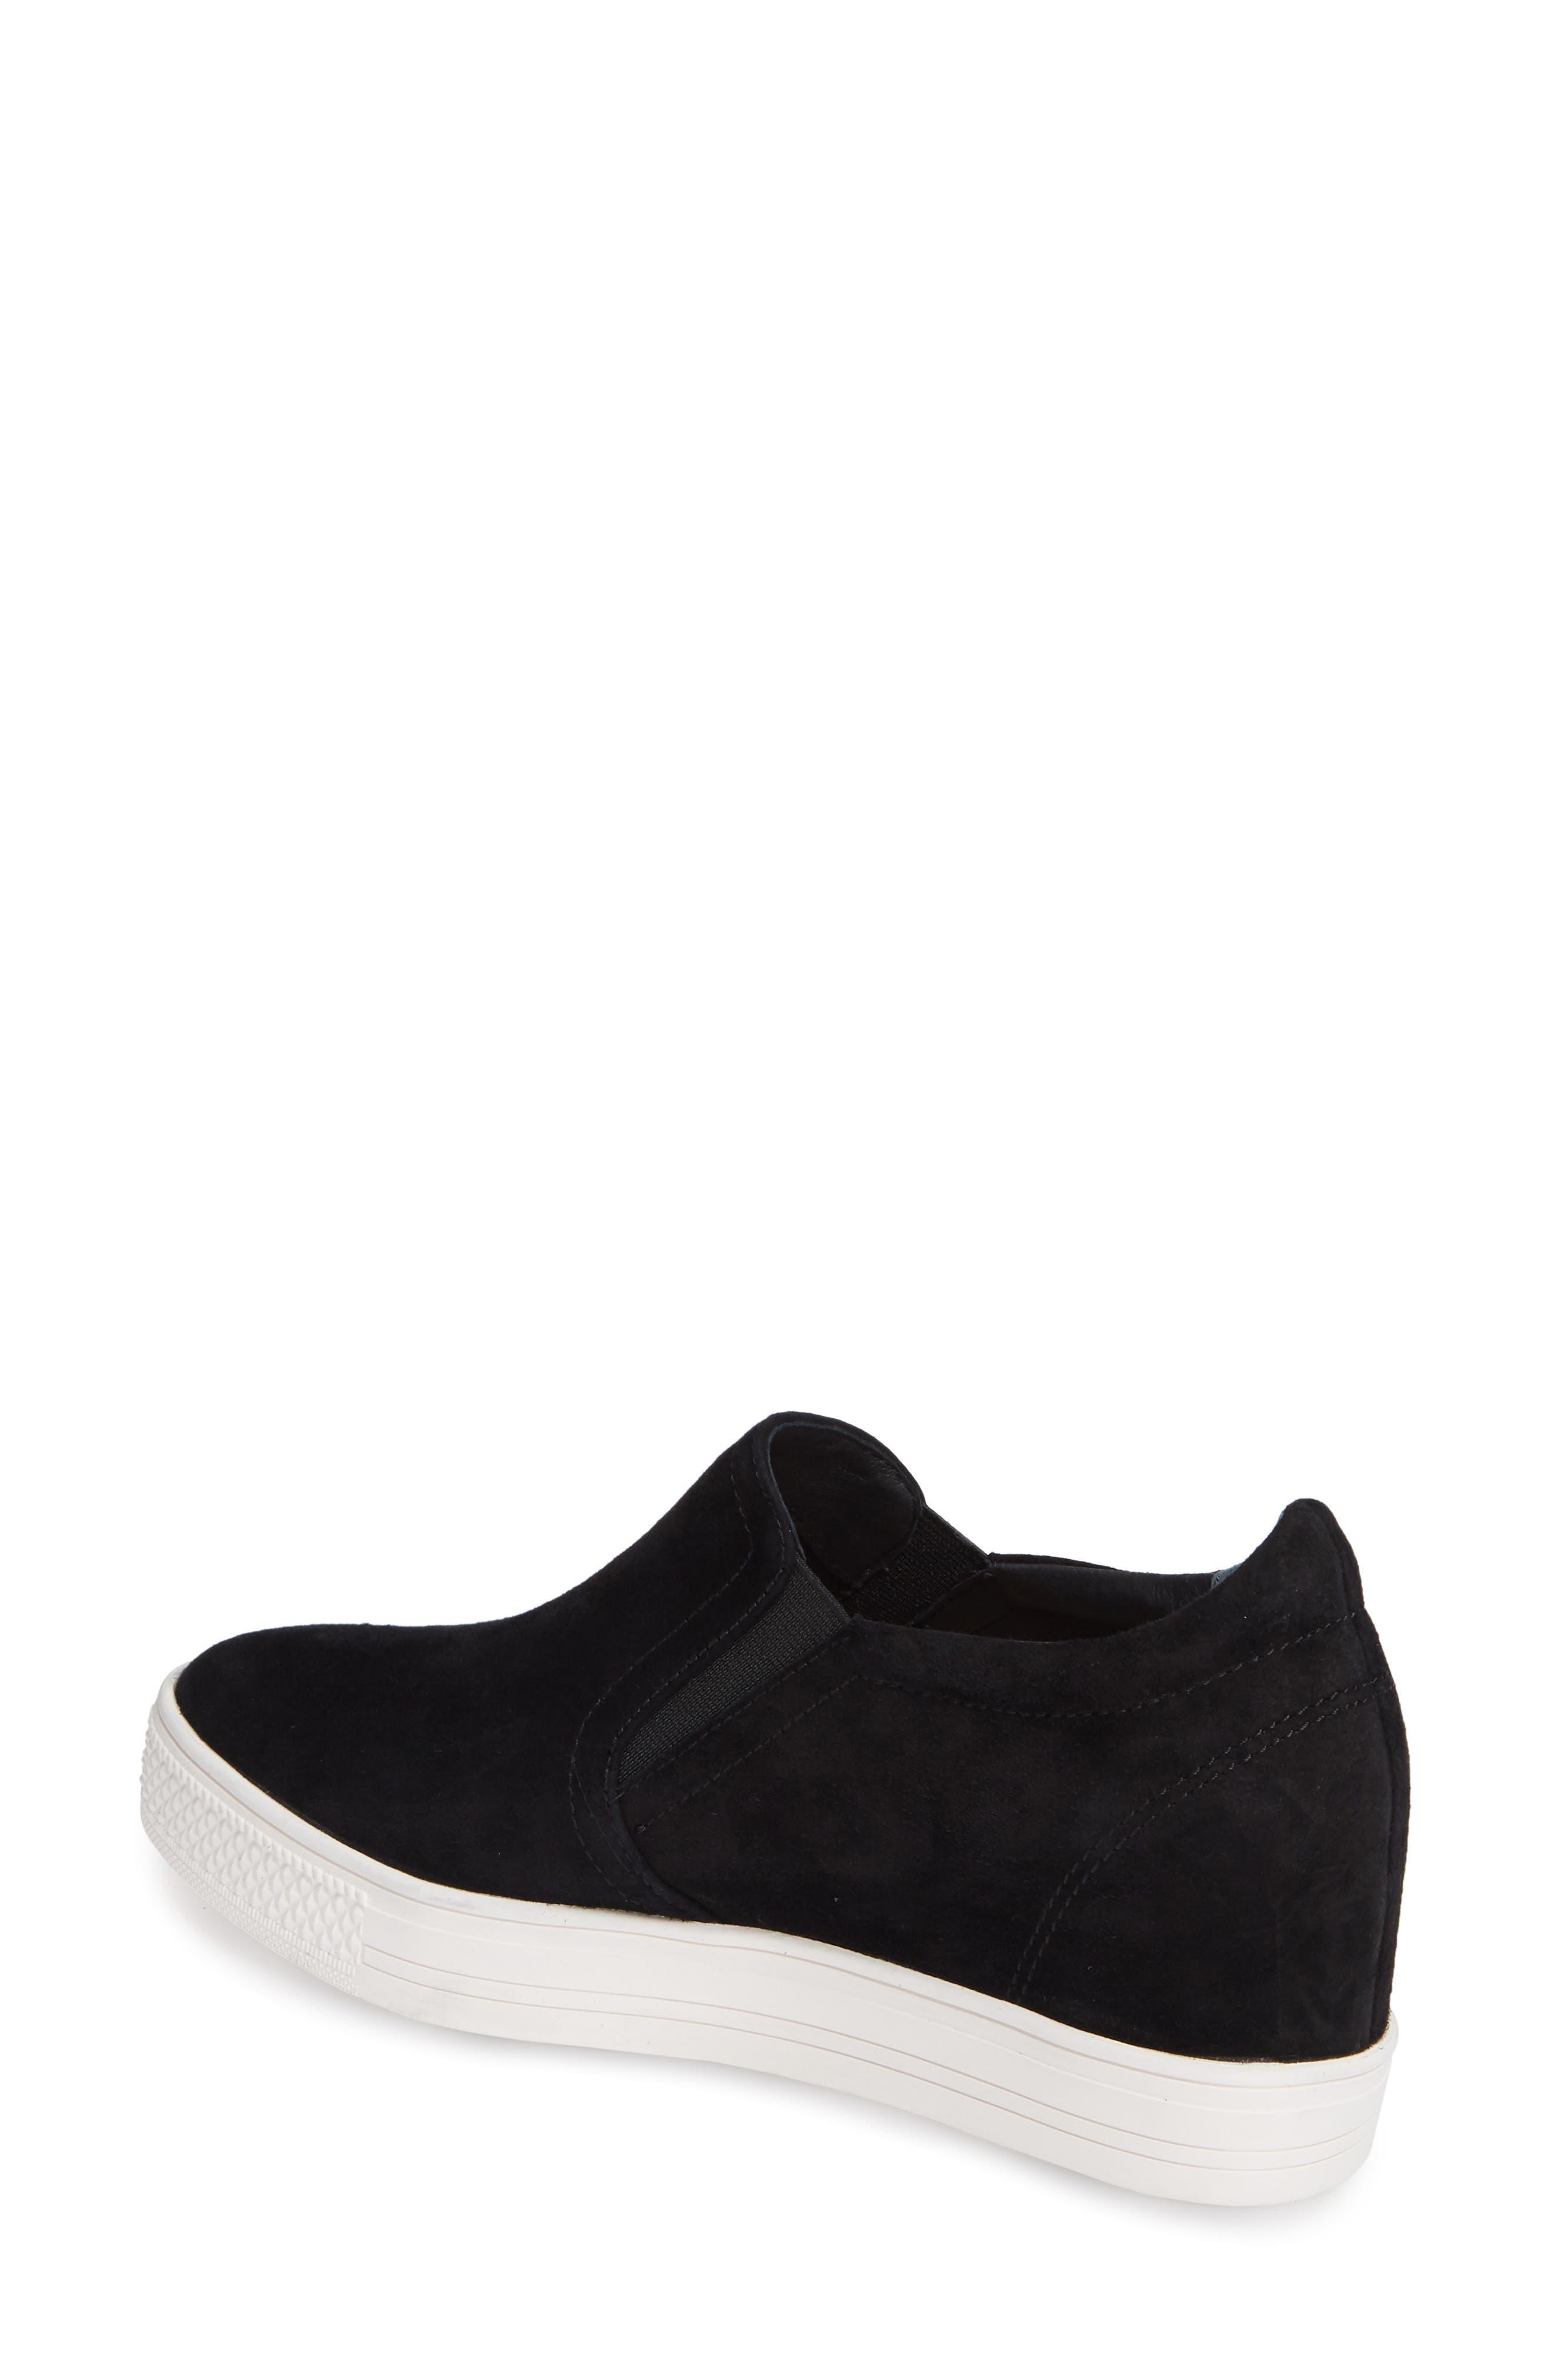 Austin Slip-On Sneaker,                             Alternate thumbnail 2, color,                             BLACK SUEDE